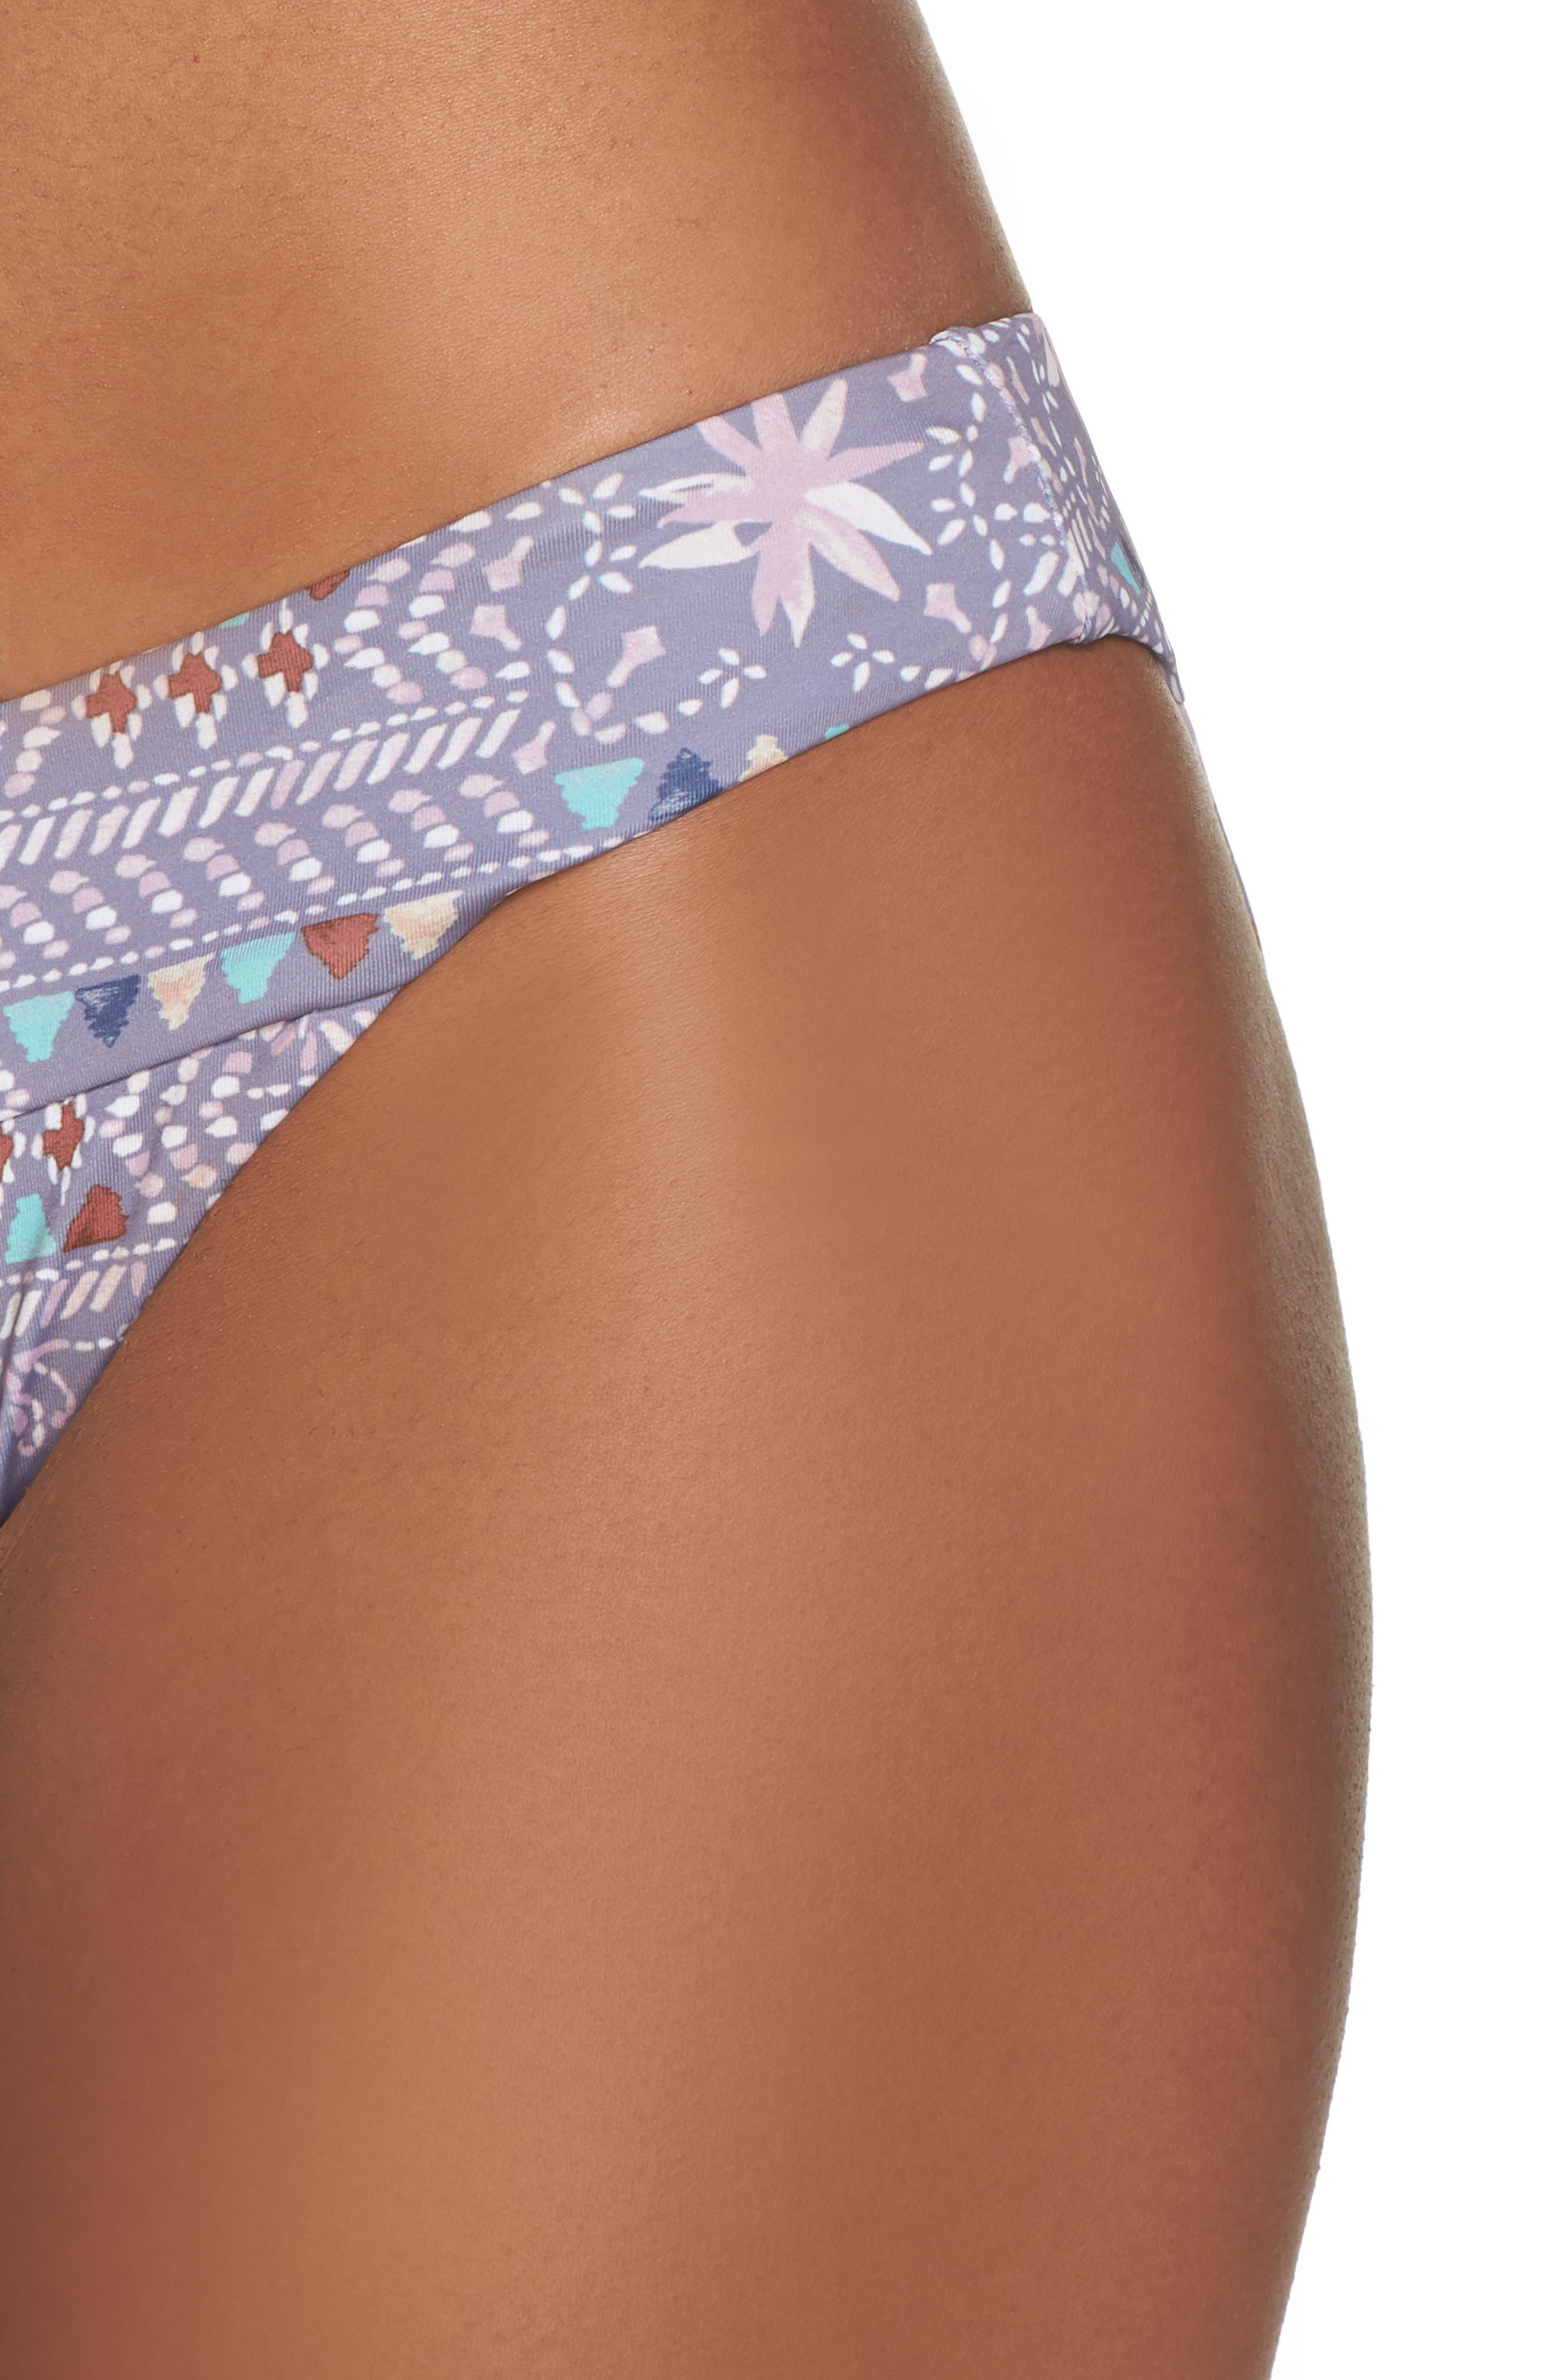 Nanogrip Nireta Bikini Bottoms,                             Alternate thumbnail 4, color,                             506